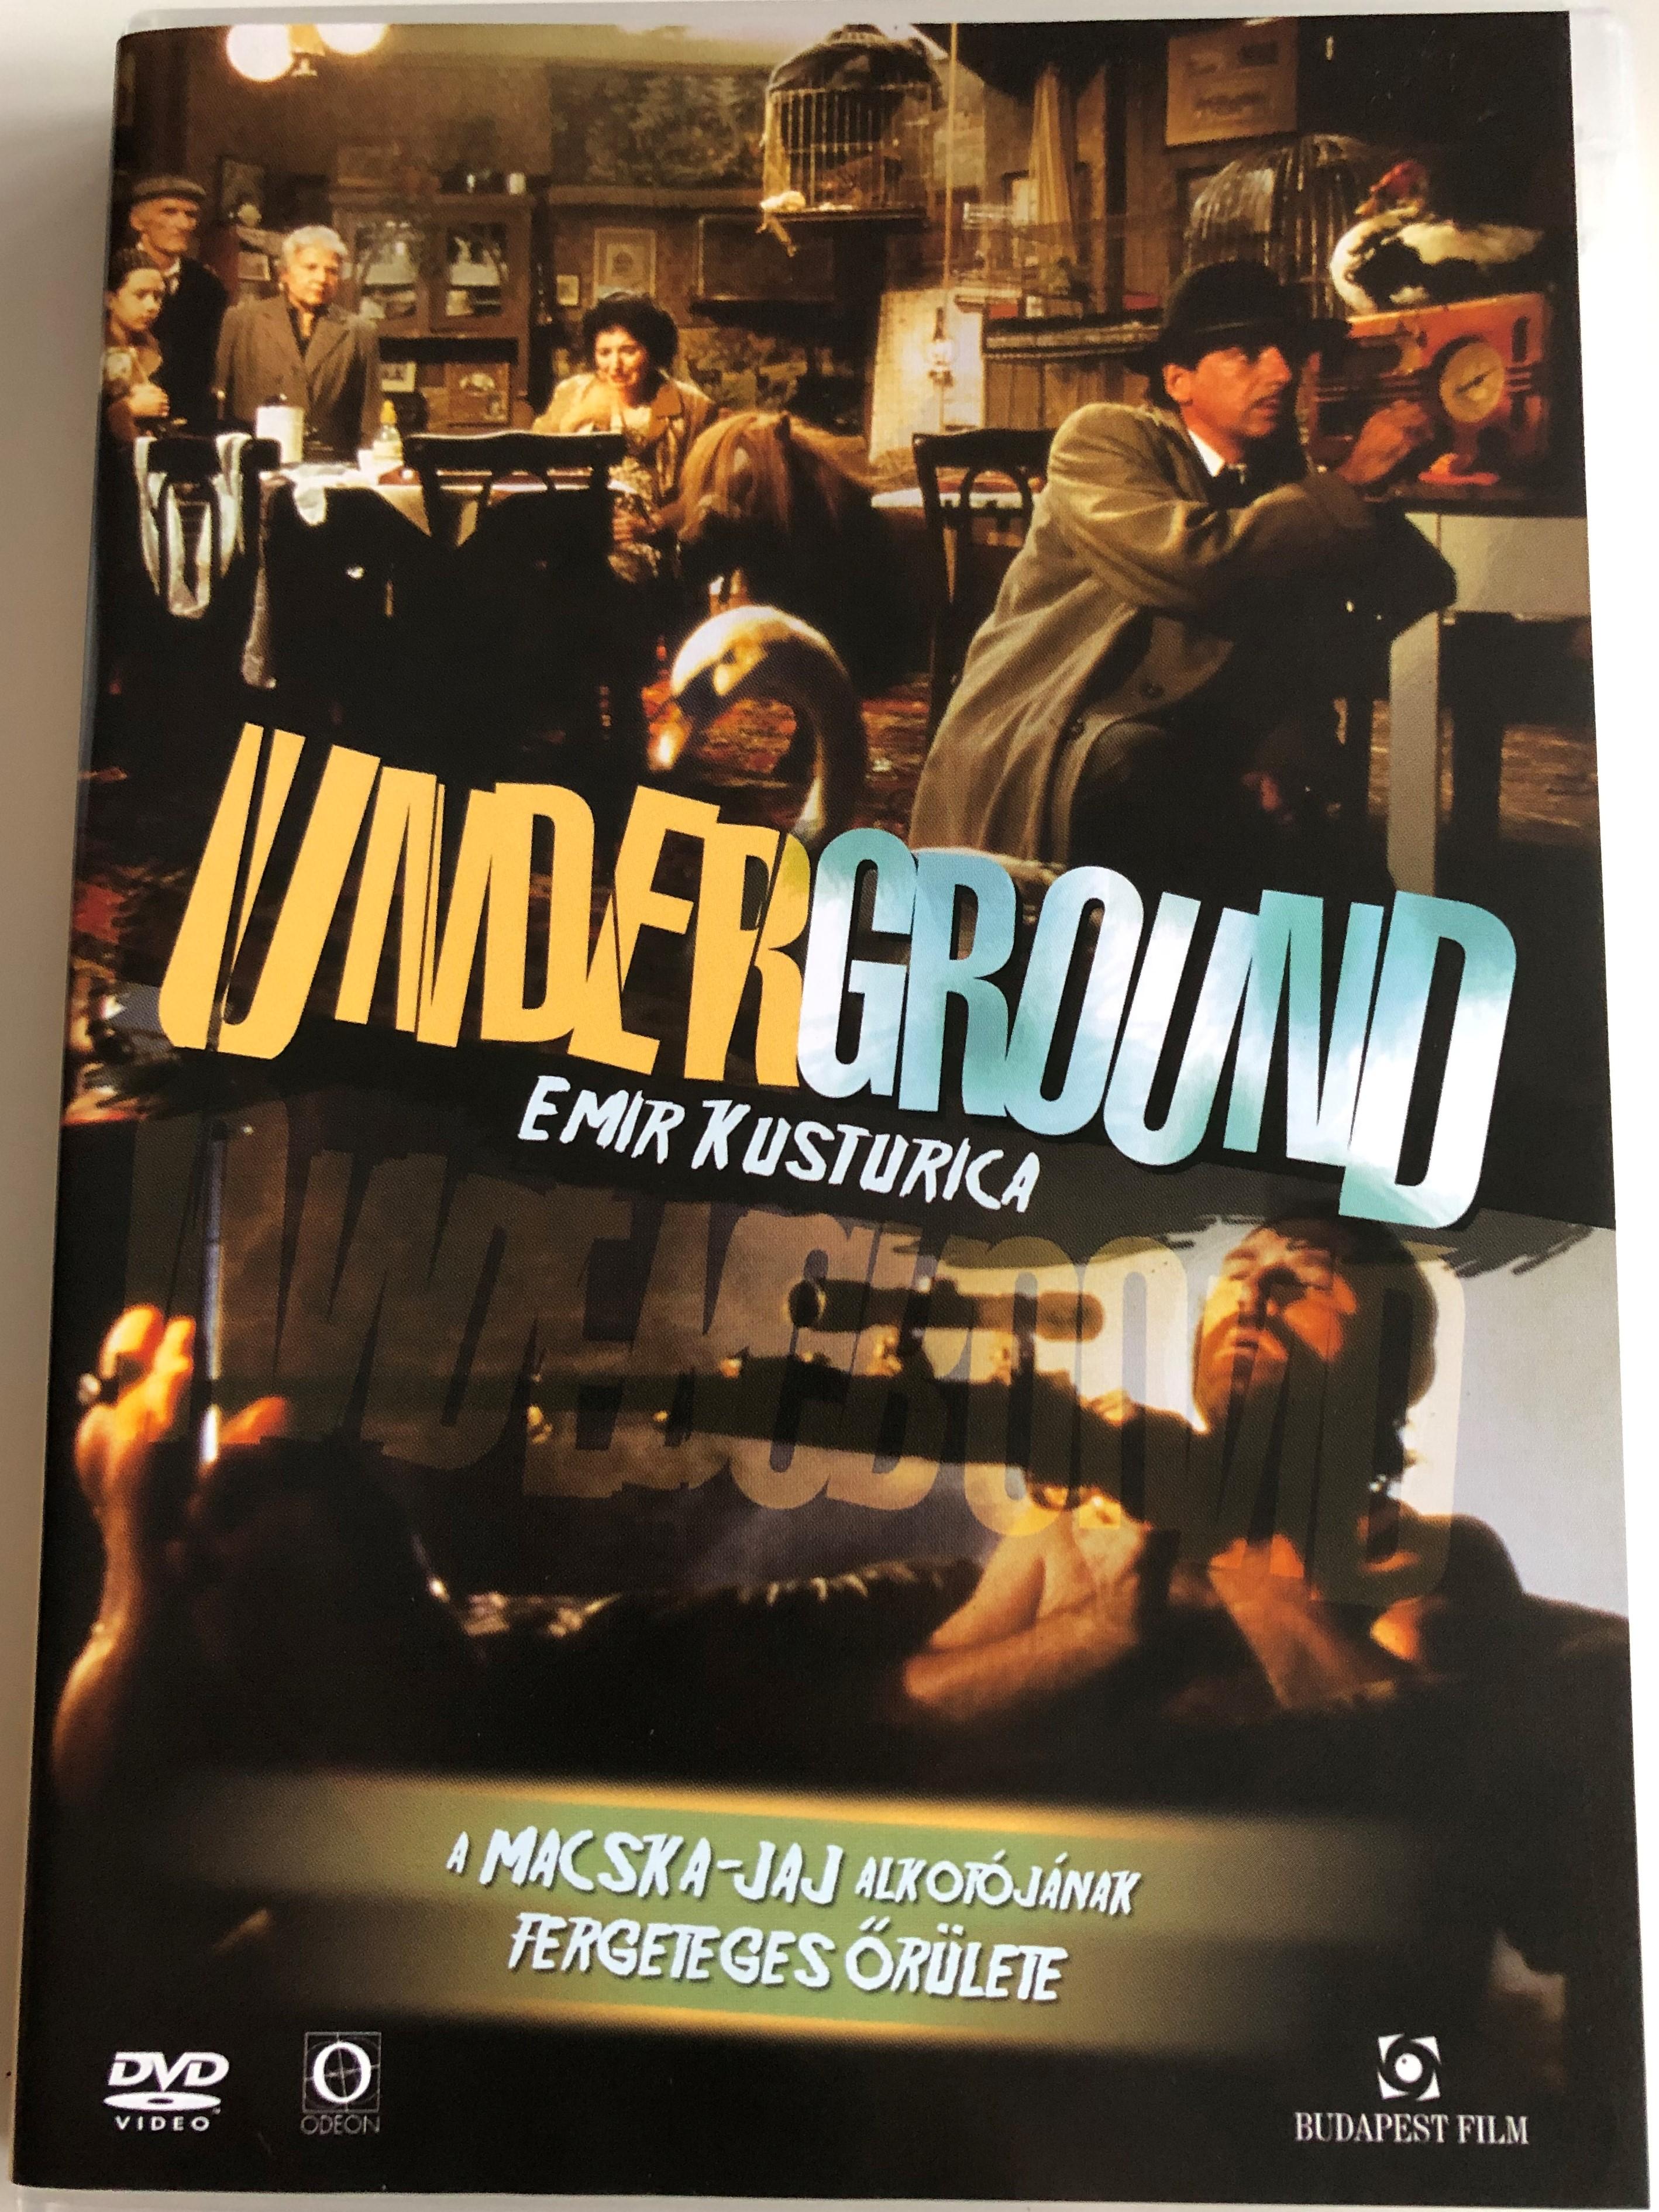 underground-dvd-1995-podzemlje-directed-emir-kusturica-1.jpg